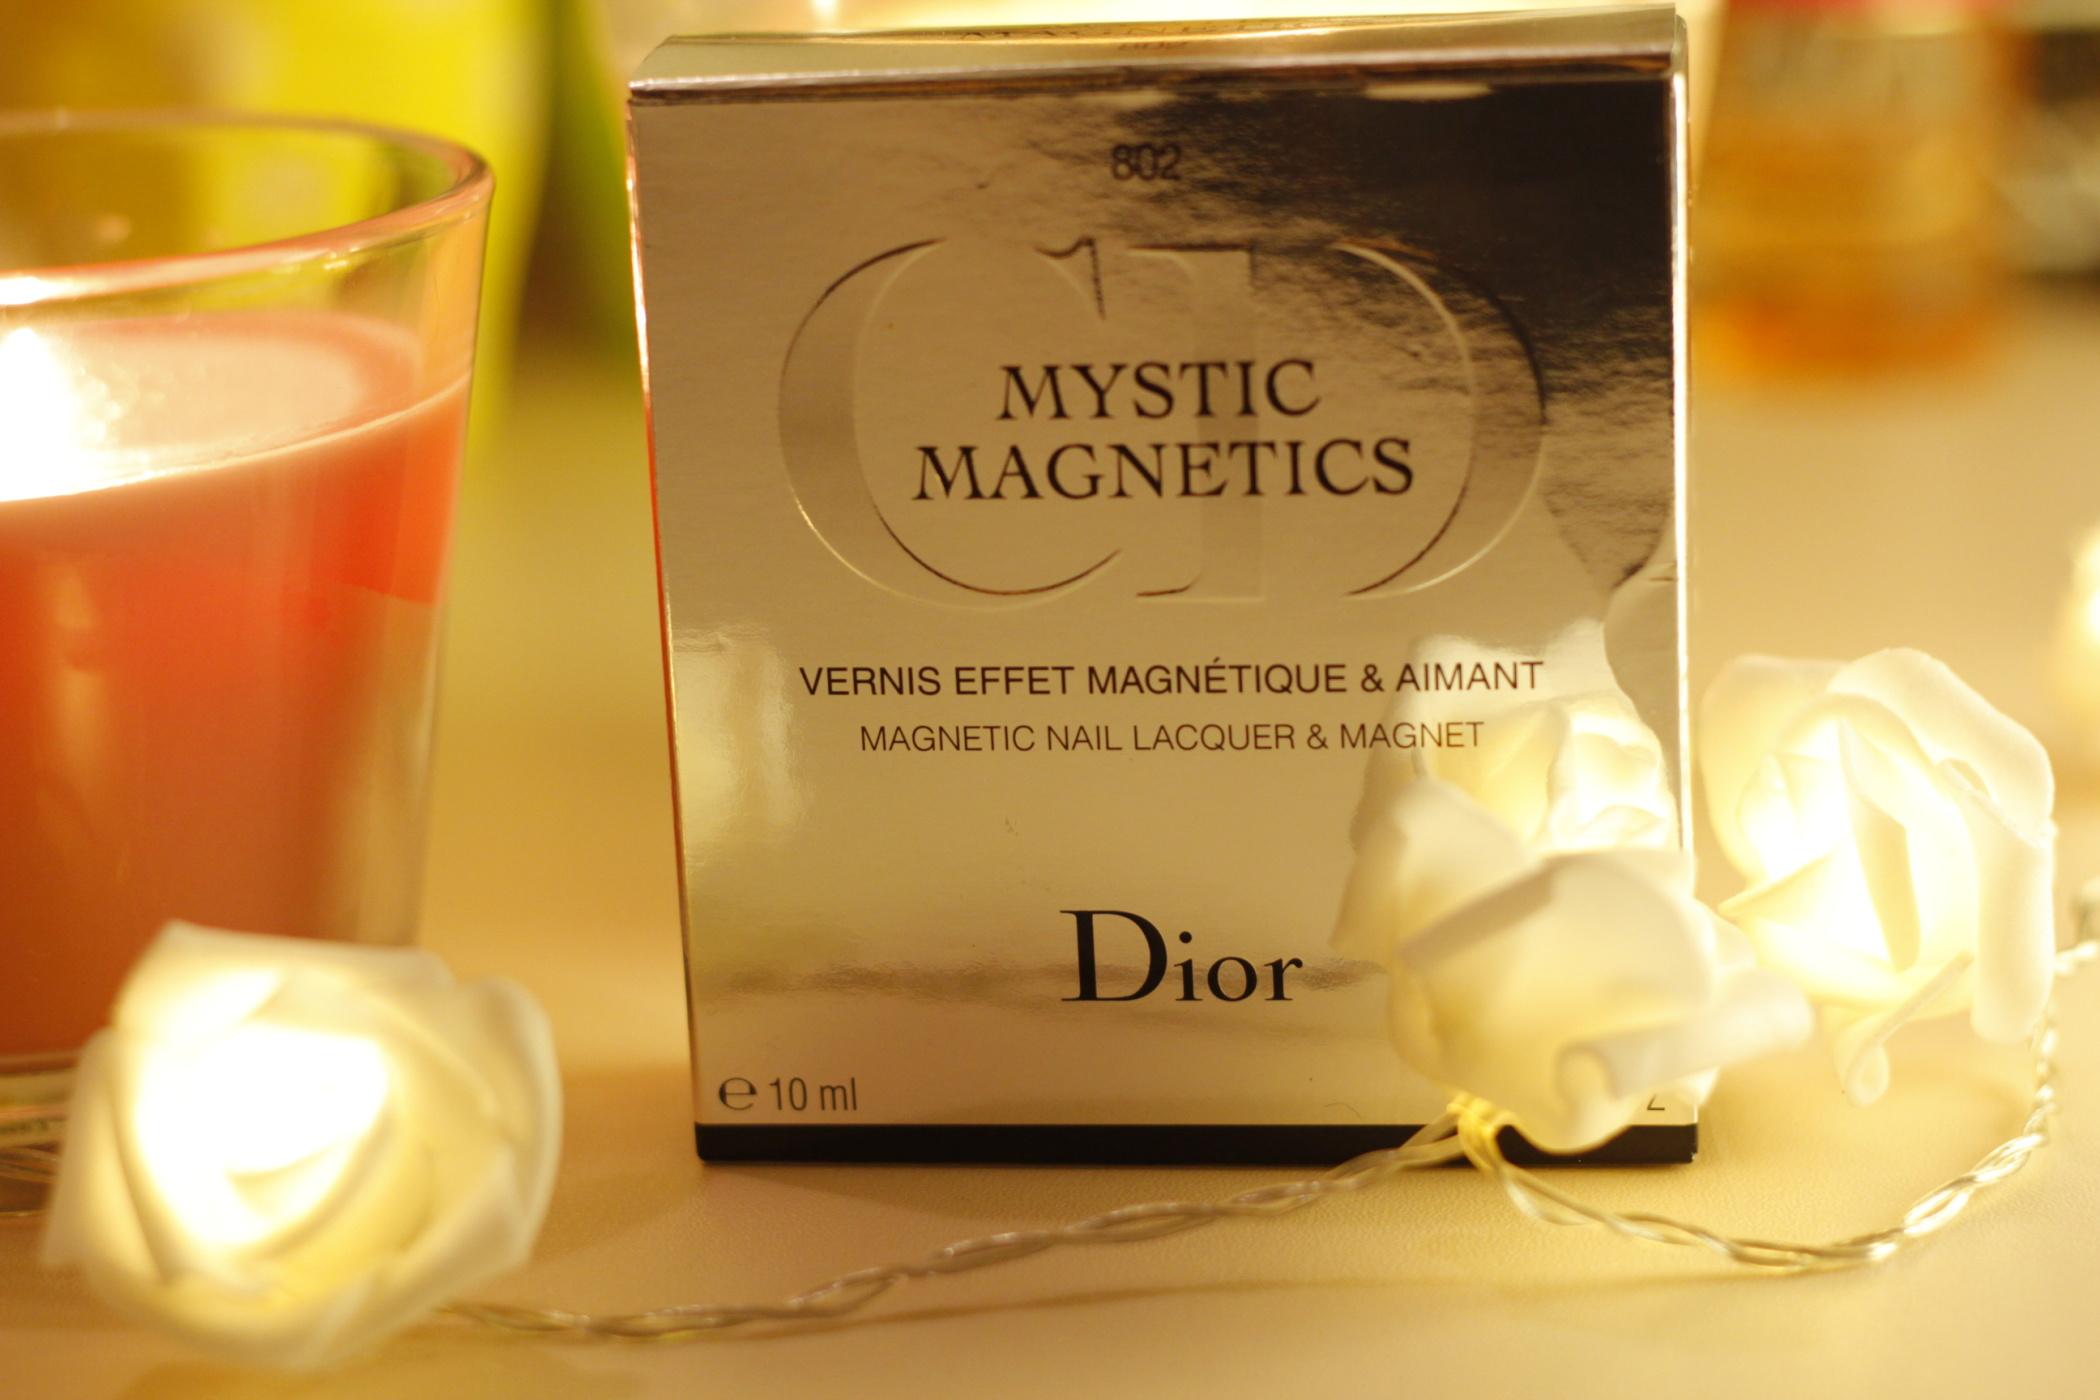 Mystic Magnetics by Dior